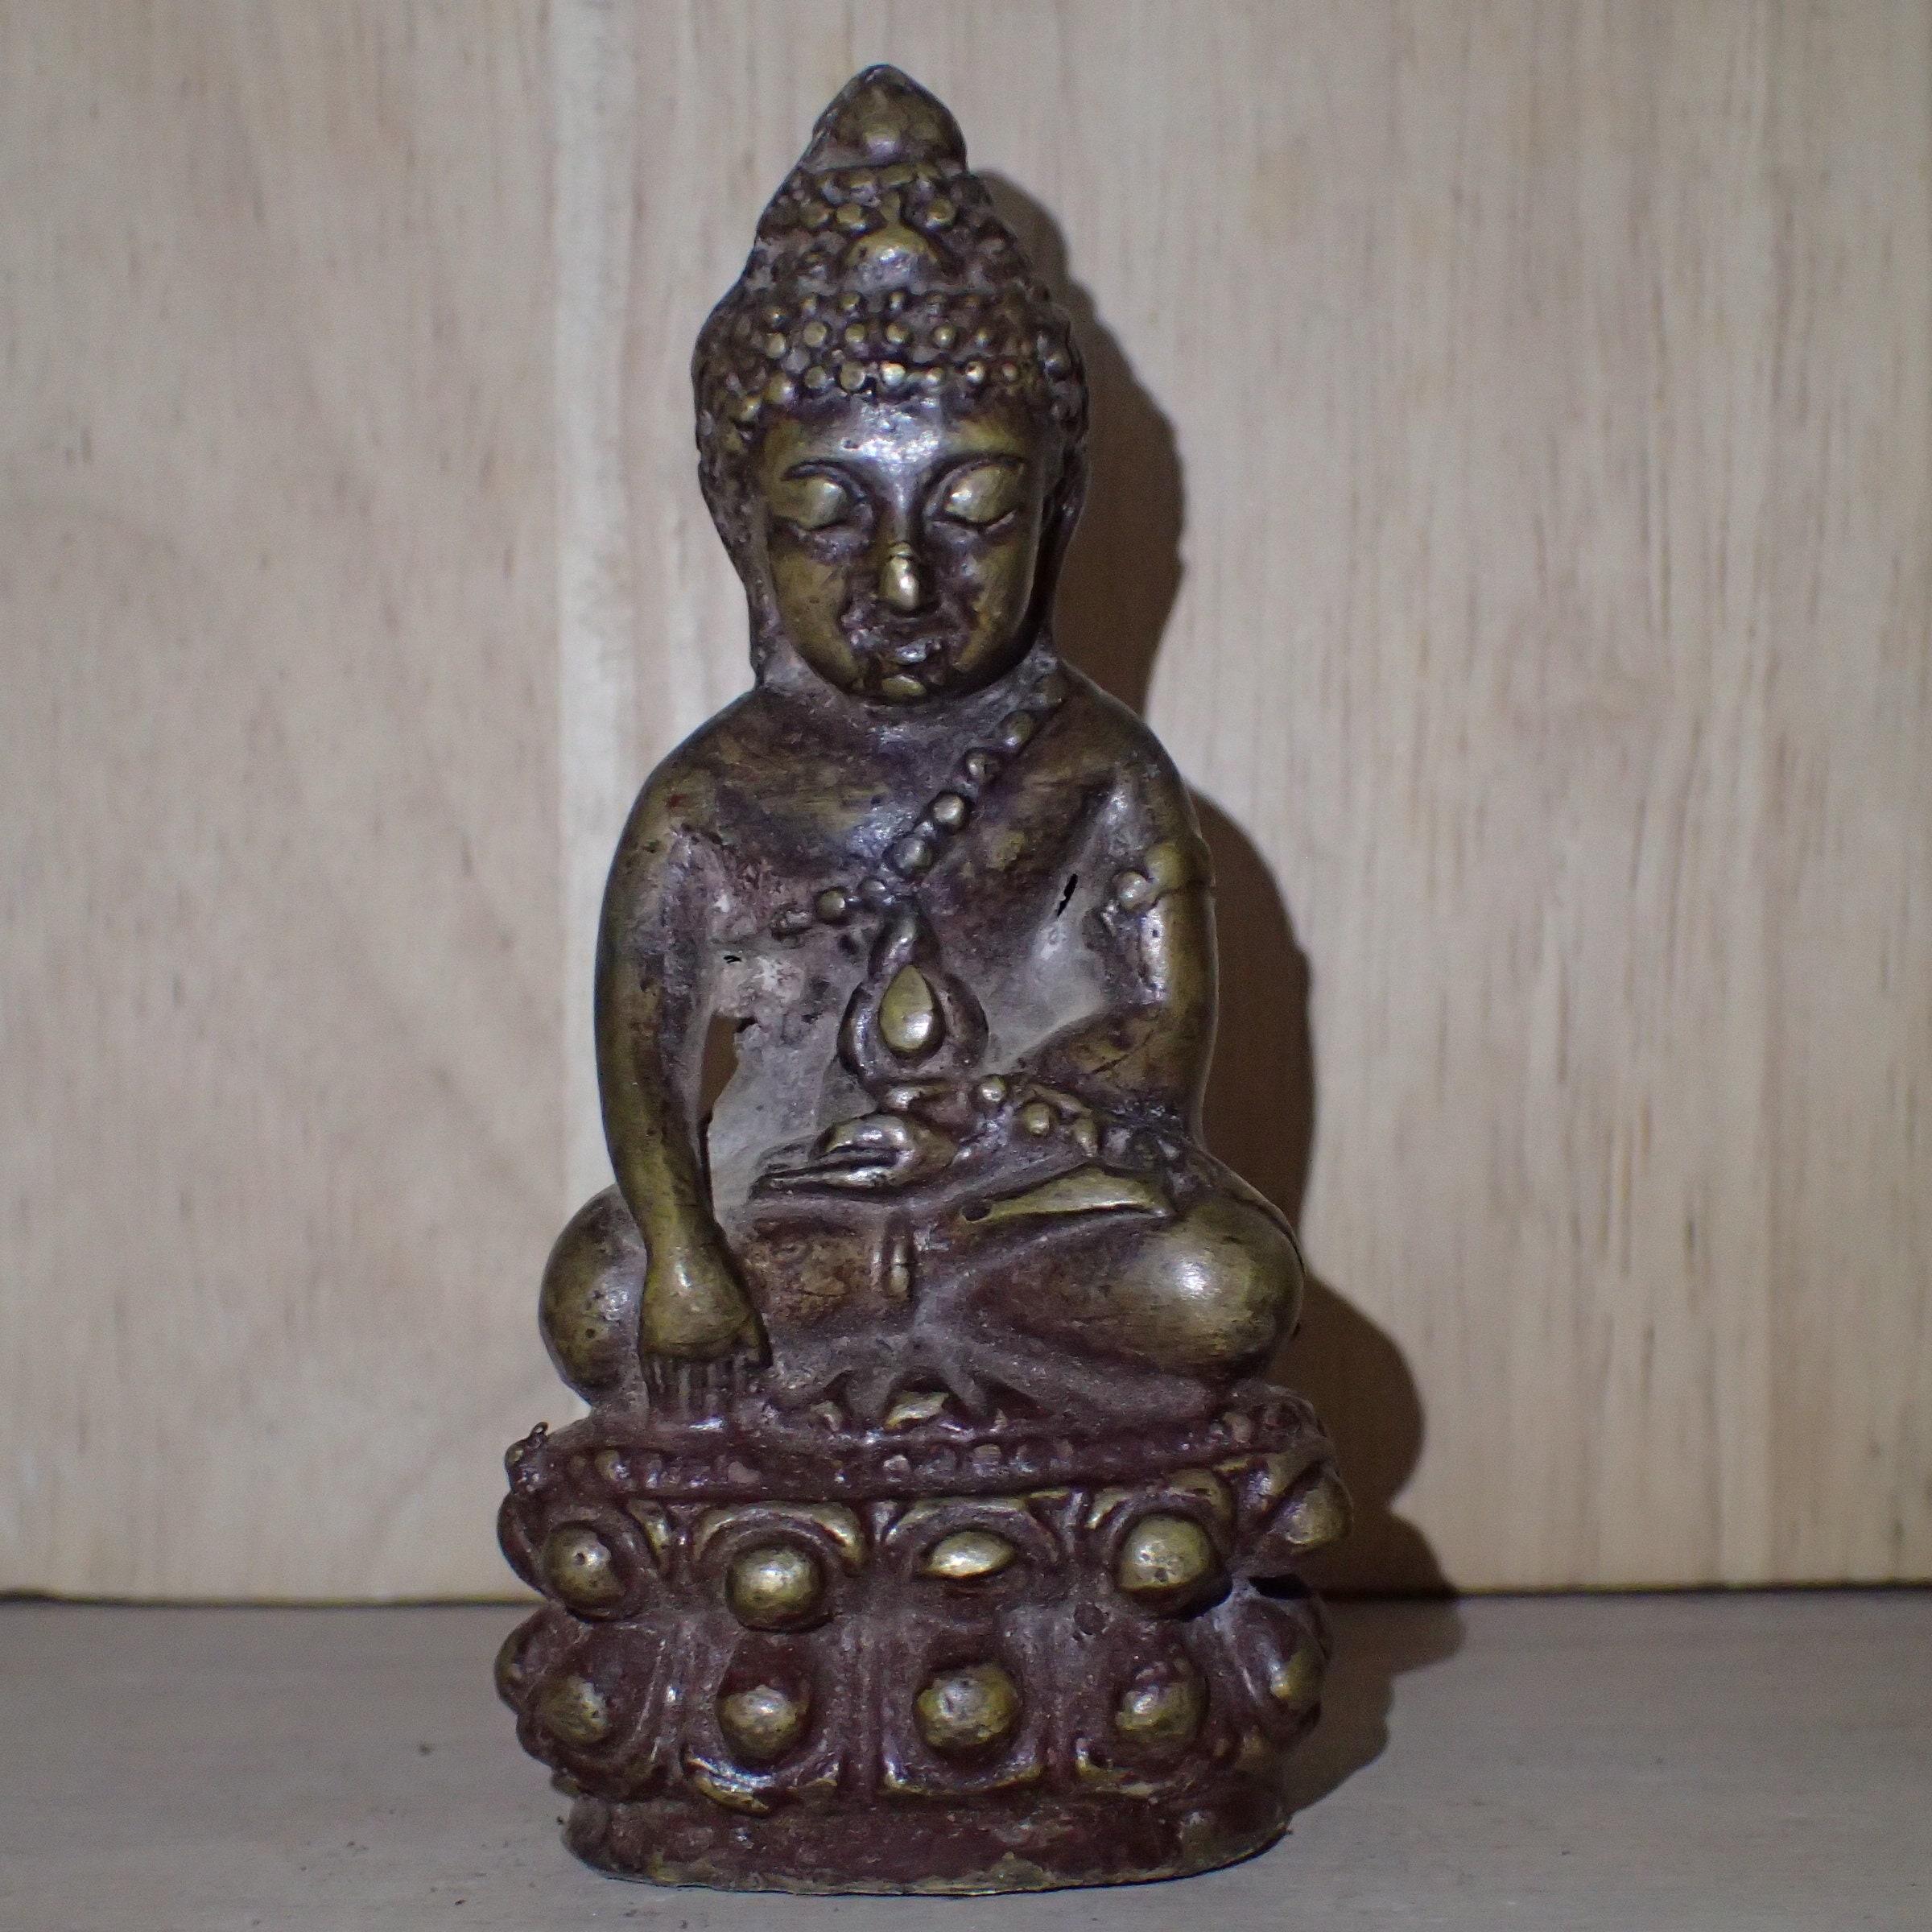 CHUCHOK//LUCK MAN PHRA LP RARE OLD THAI BUDDHA AMULET PENDANT MAGIC ANCIENT#6